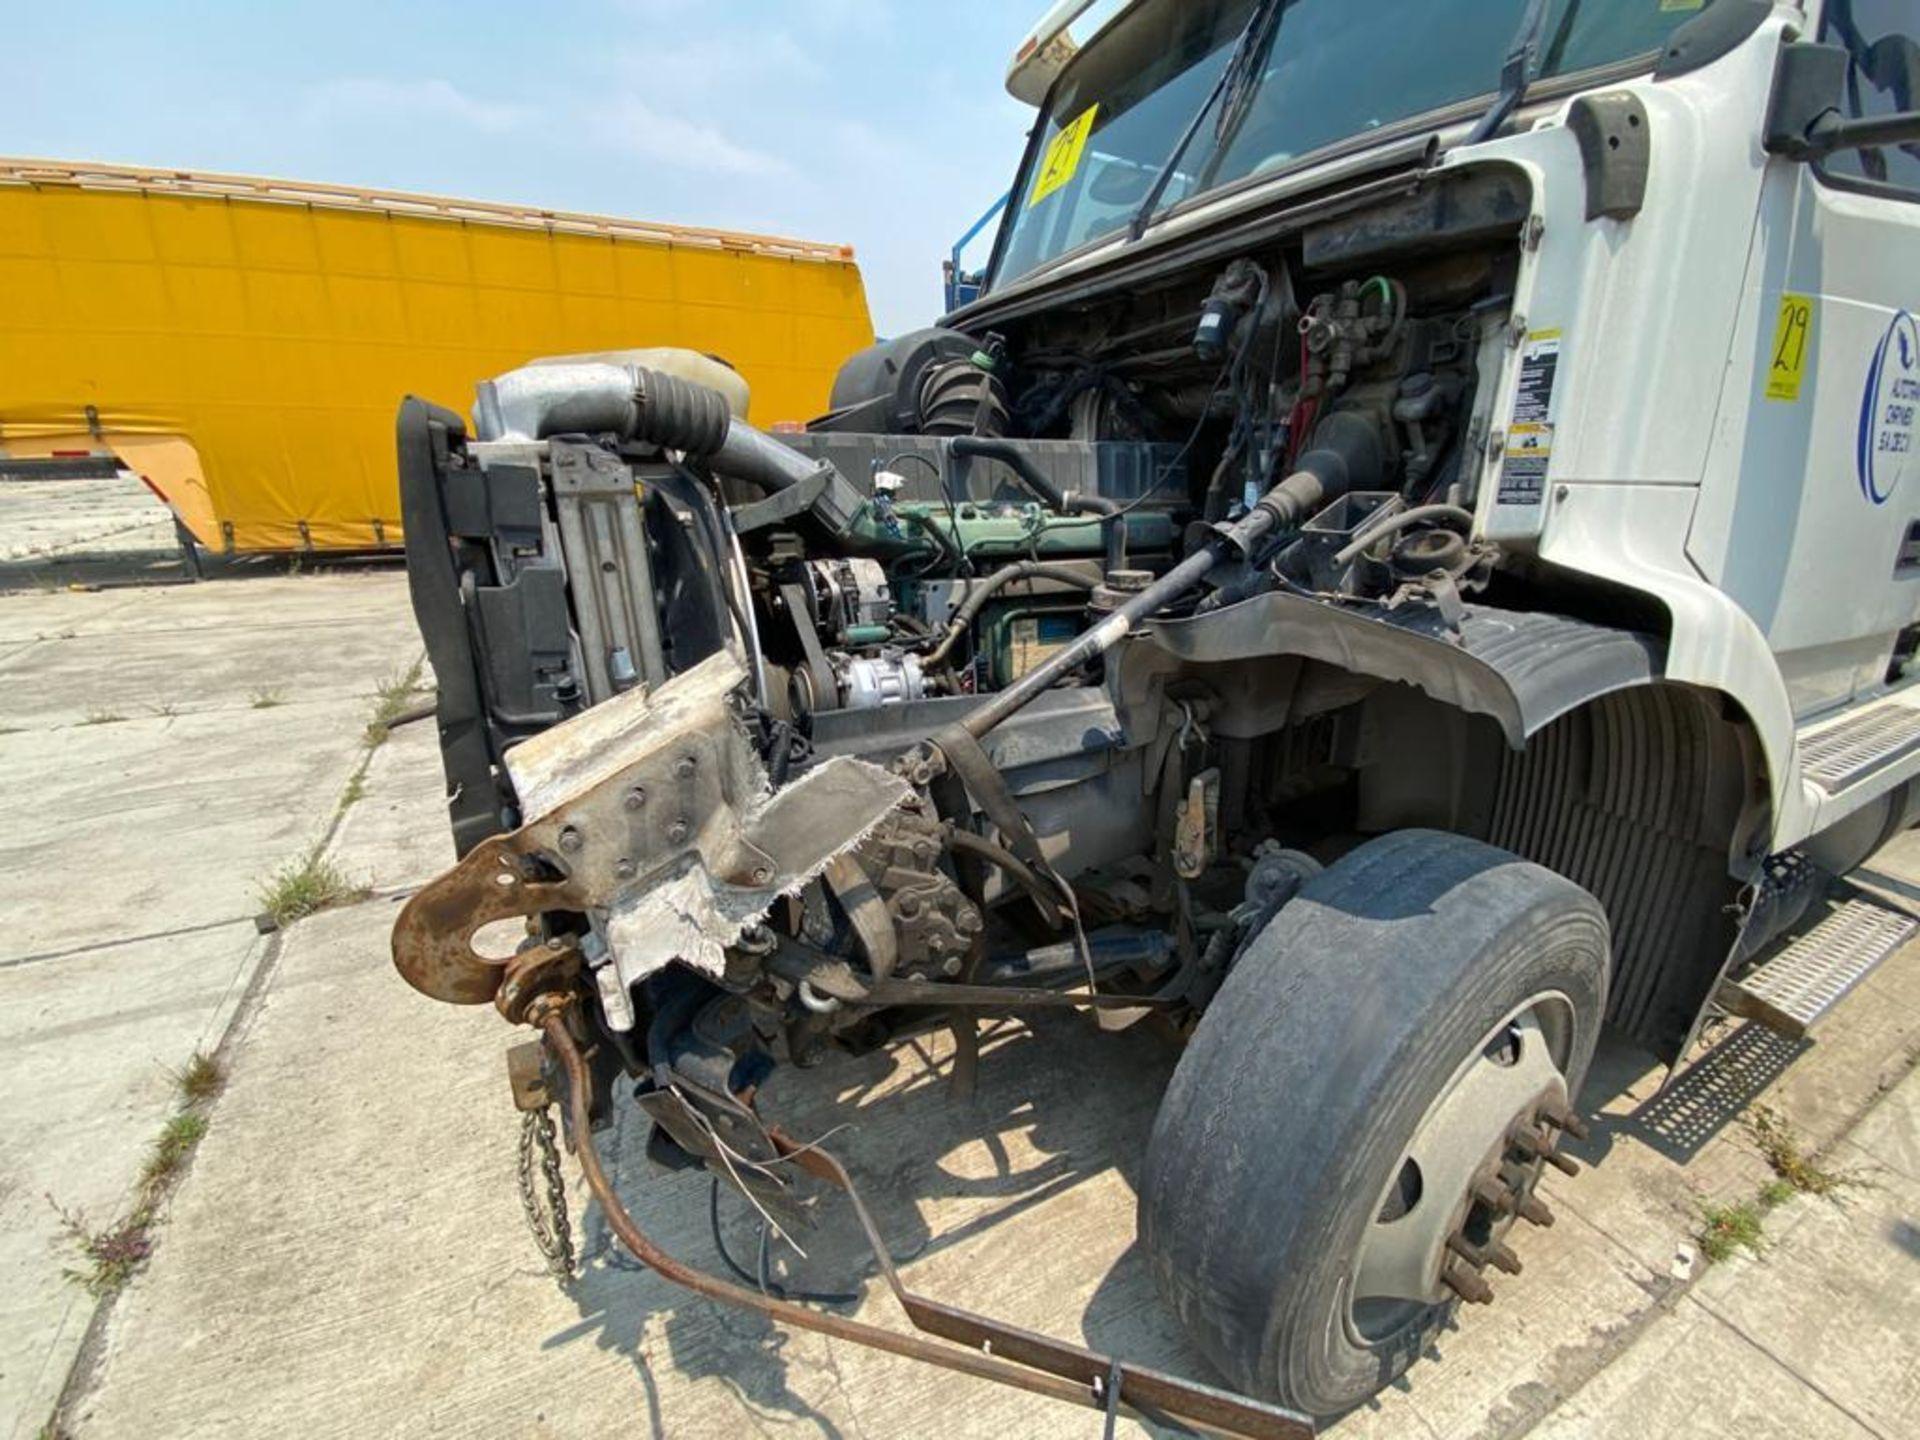 2001 Volvo Sleeper Truck Tractor, estándar transmissión of 18 speeds, with Volvo motor - Image 37 of 60